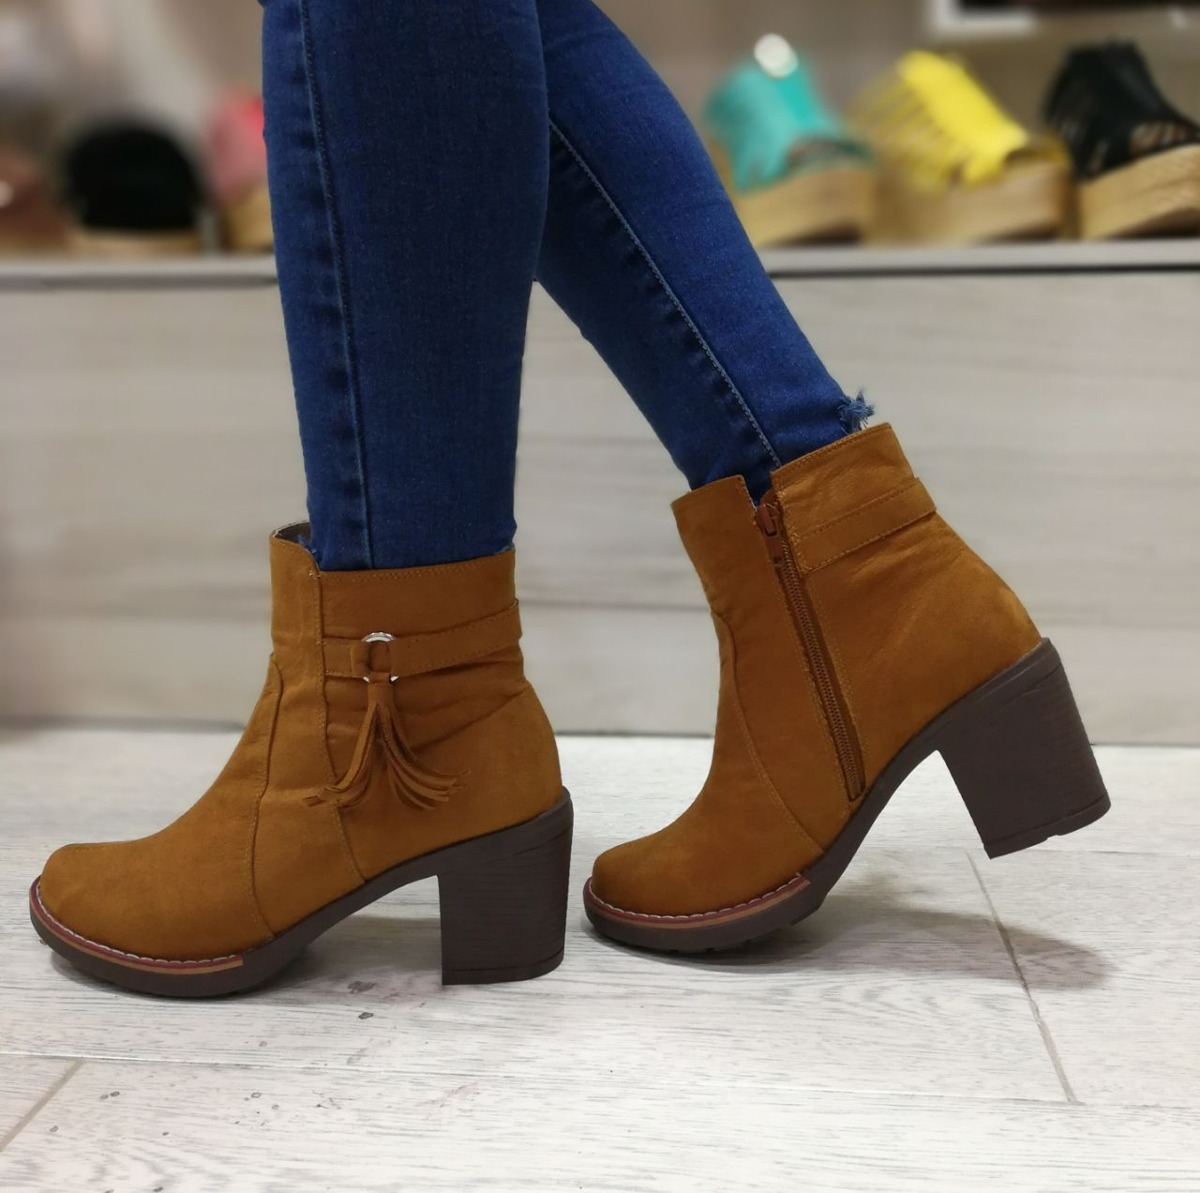 0f376710d08 bota para dama moda femenina calzado mujer botin dama tacon. Cargando zoom.